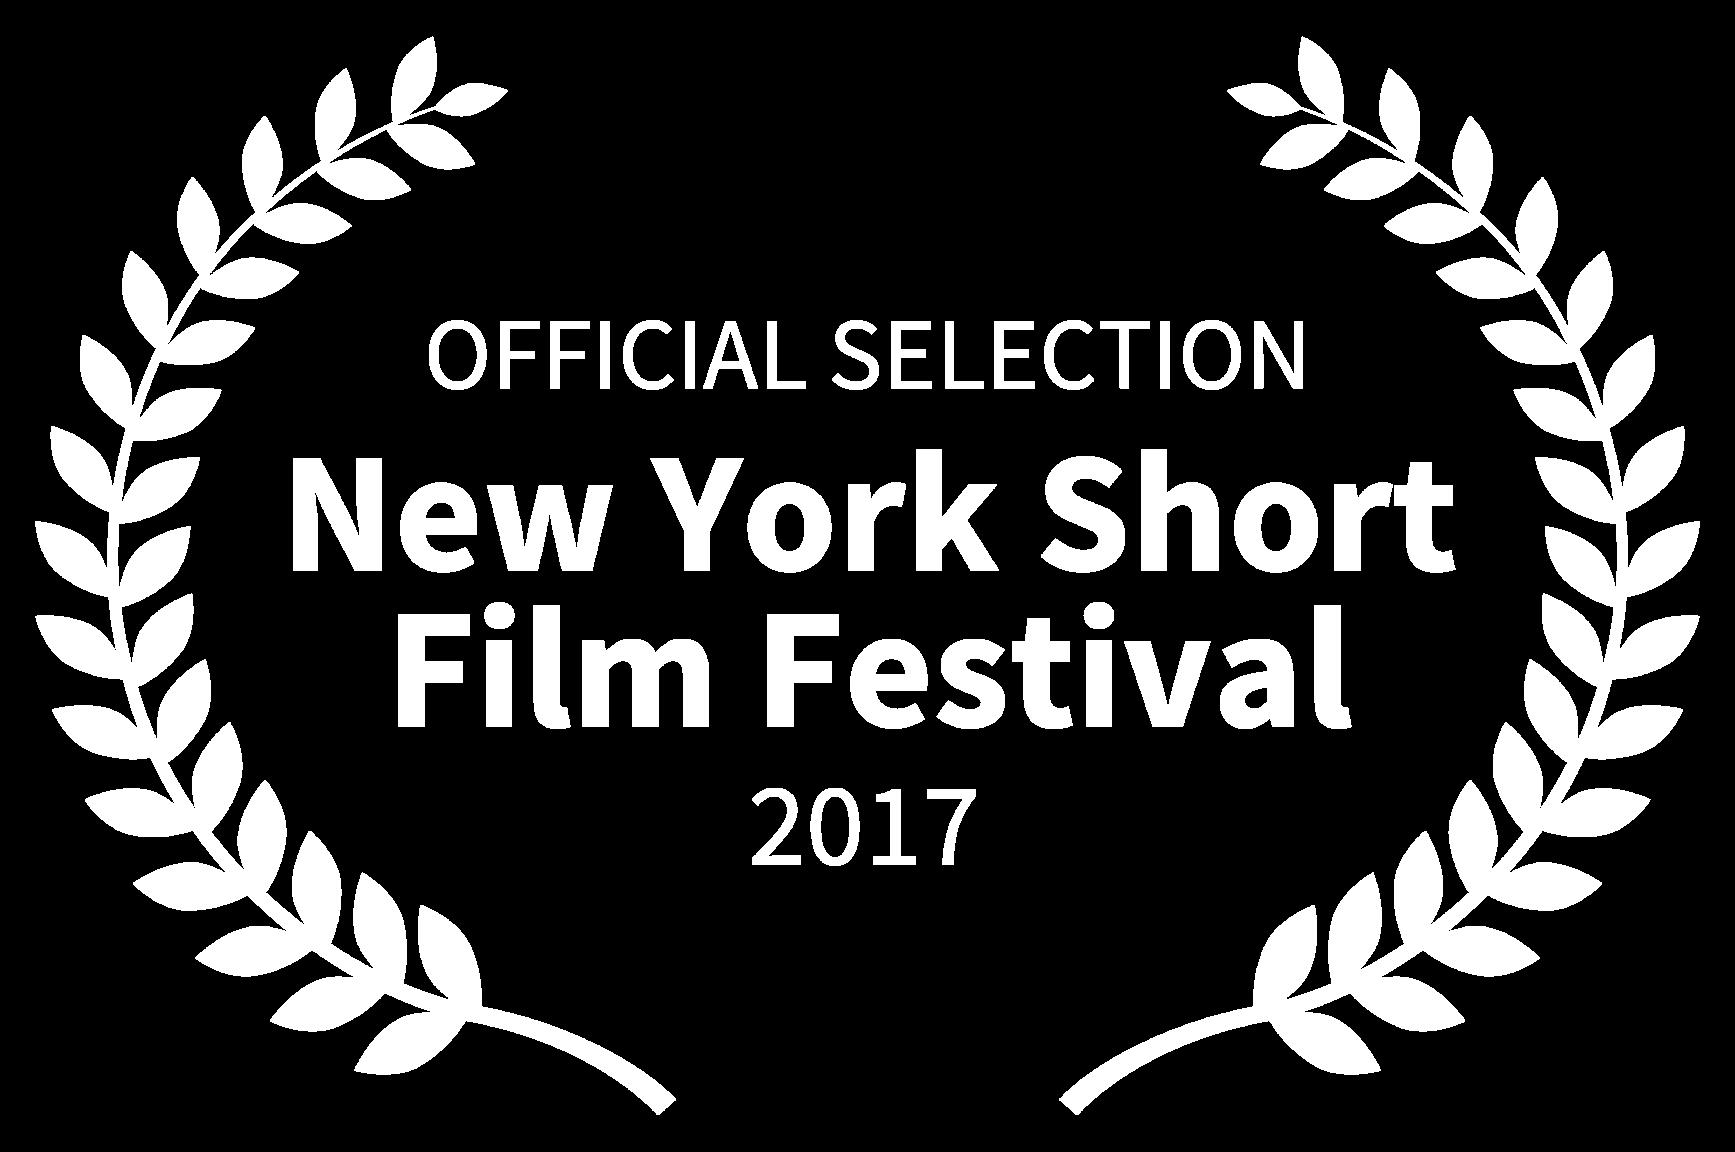 OFFICIAL SELECTION - New York Short Film Festival - 2017.png